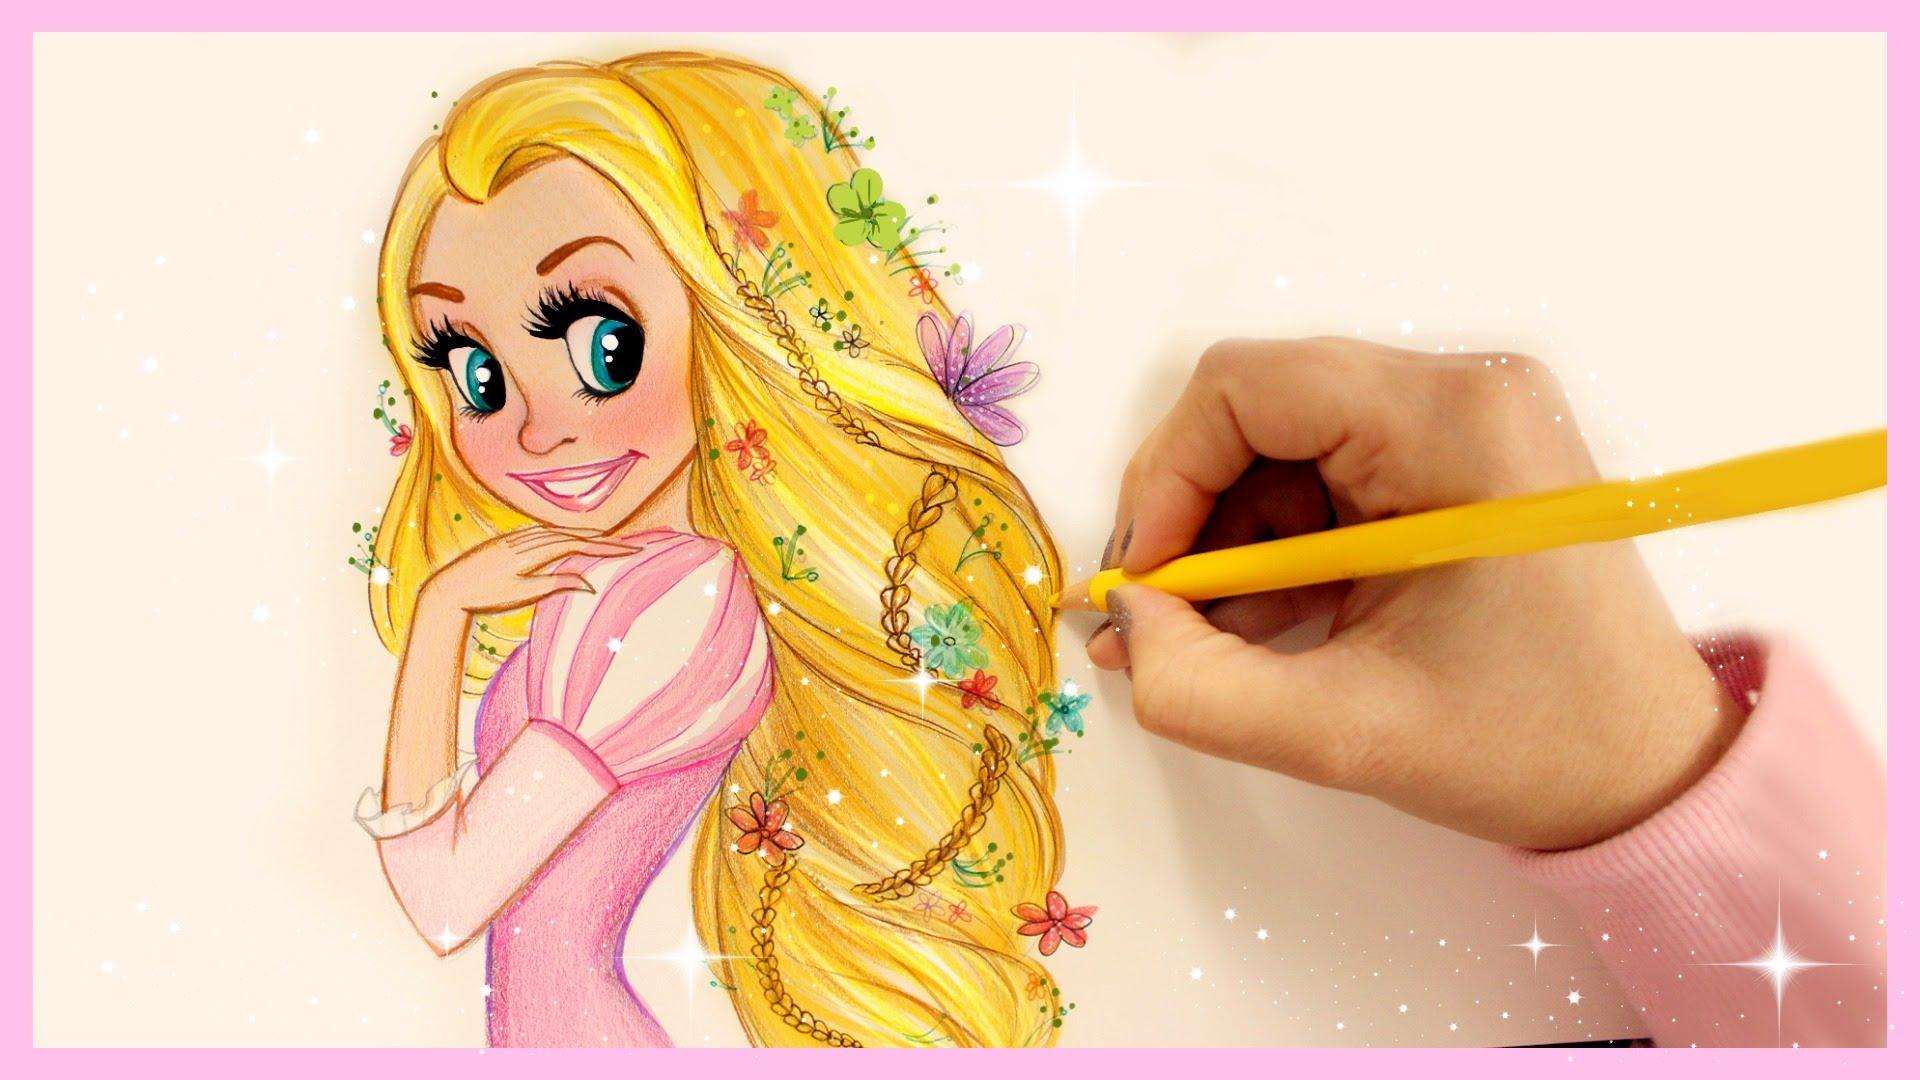 Drawn princess hairstyle disney YouTube Rapunzel ❤ How